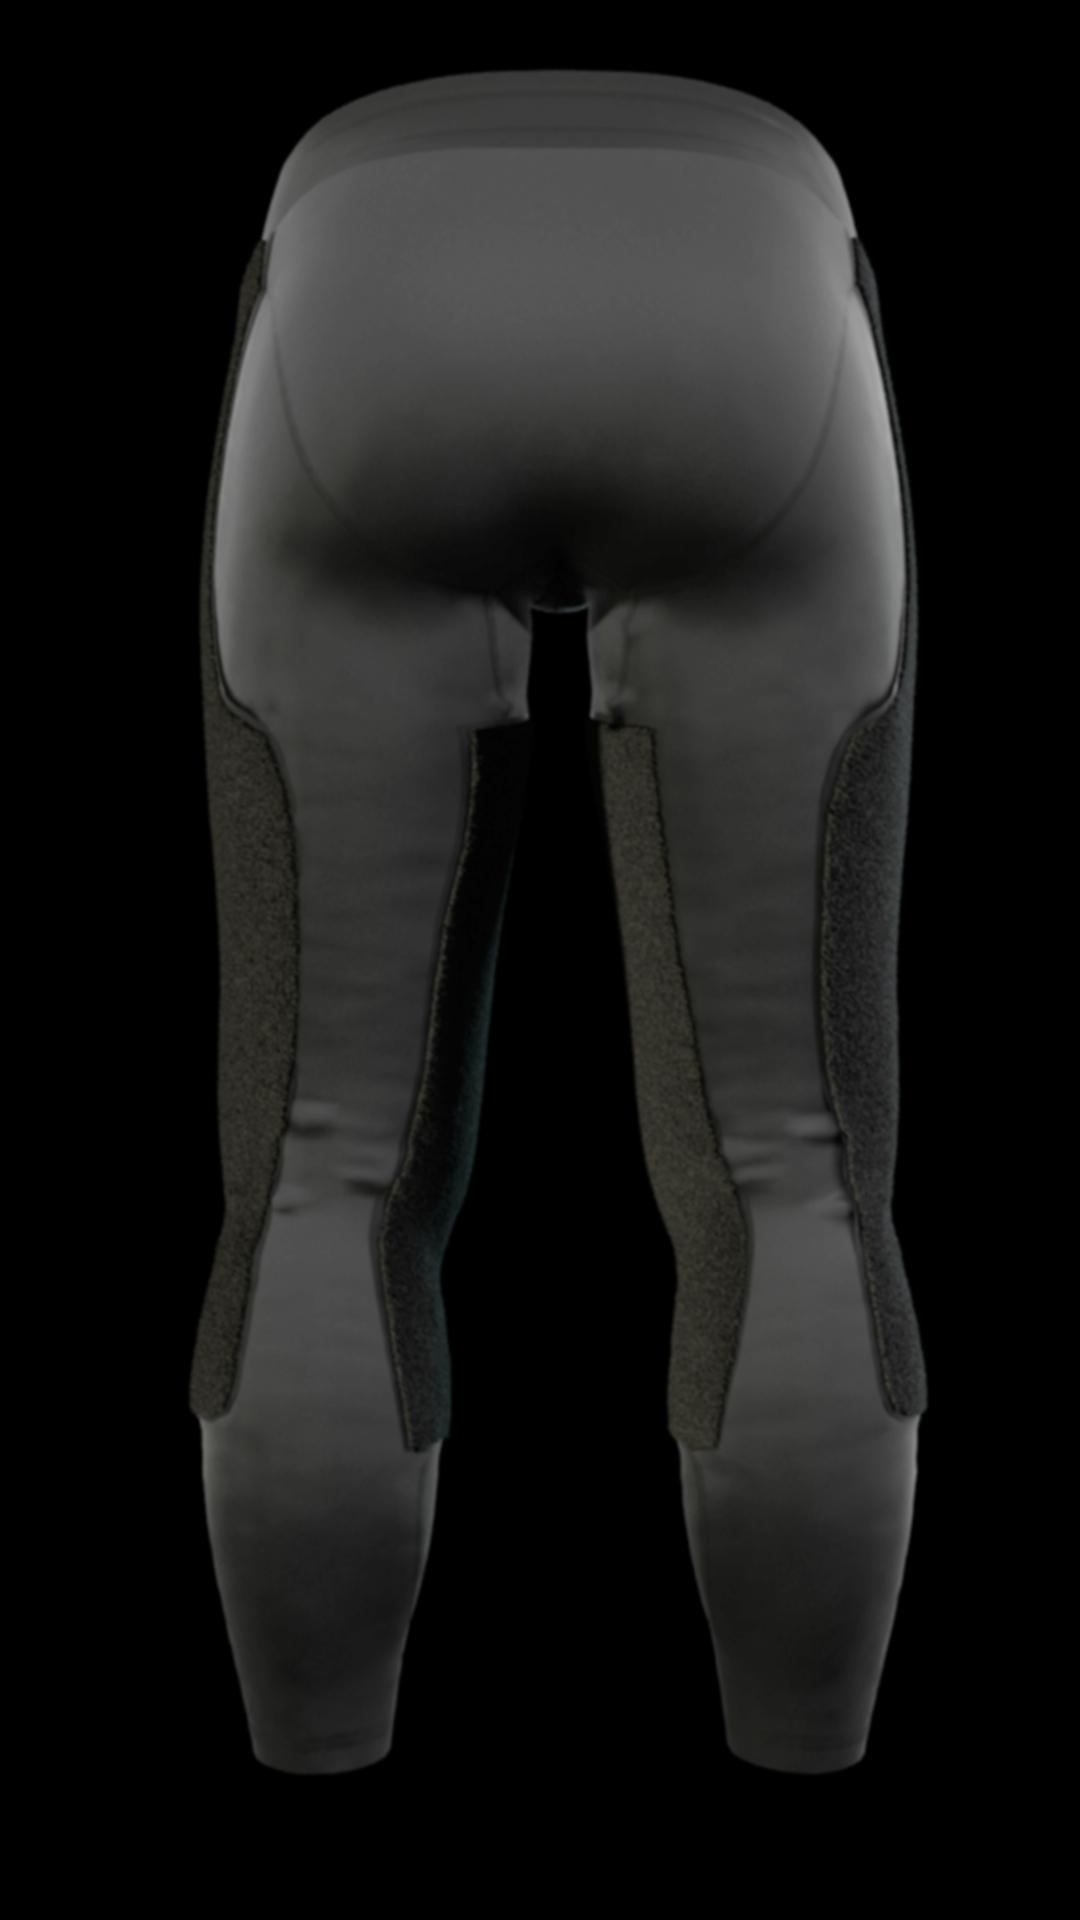 pants4pics4.png